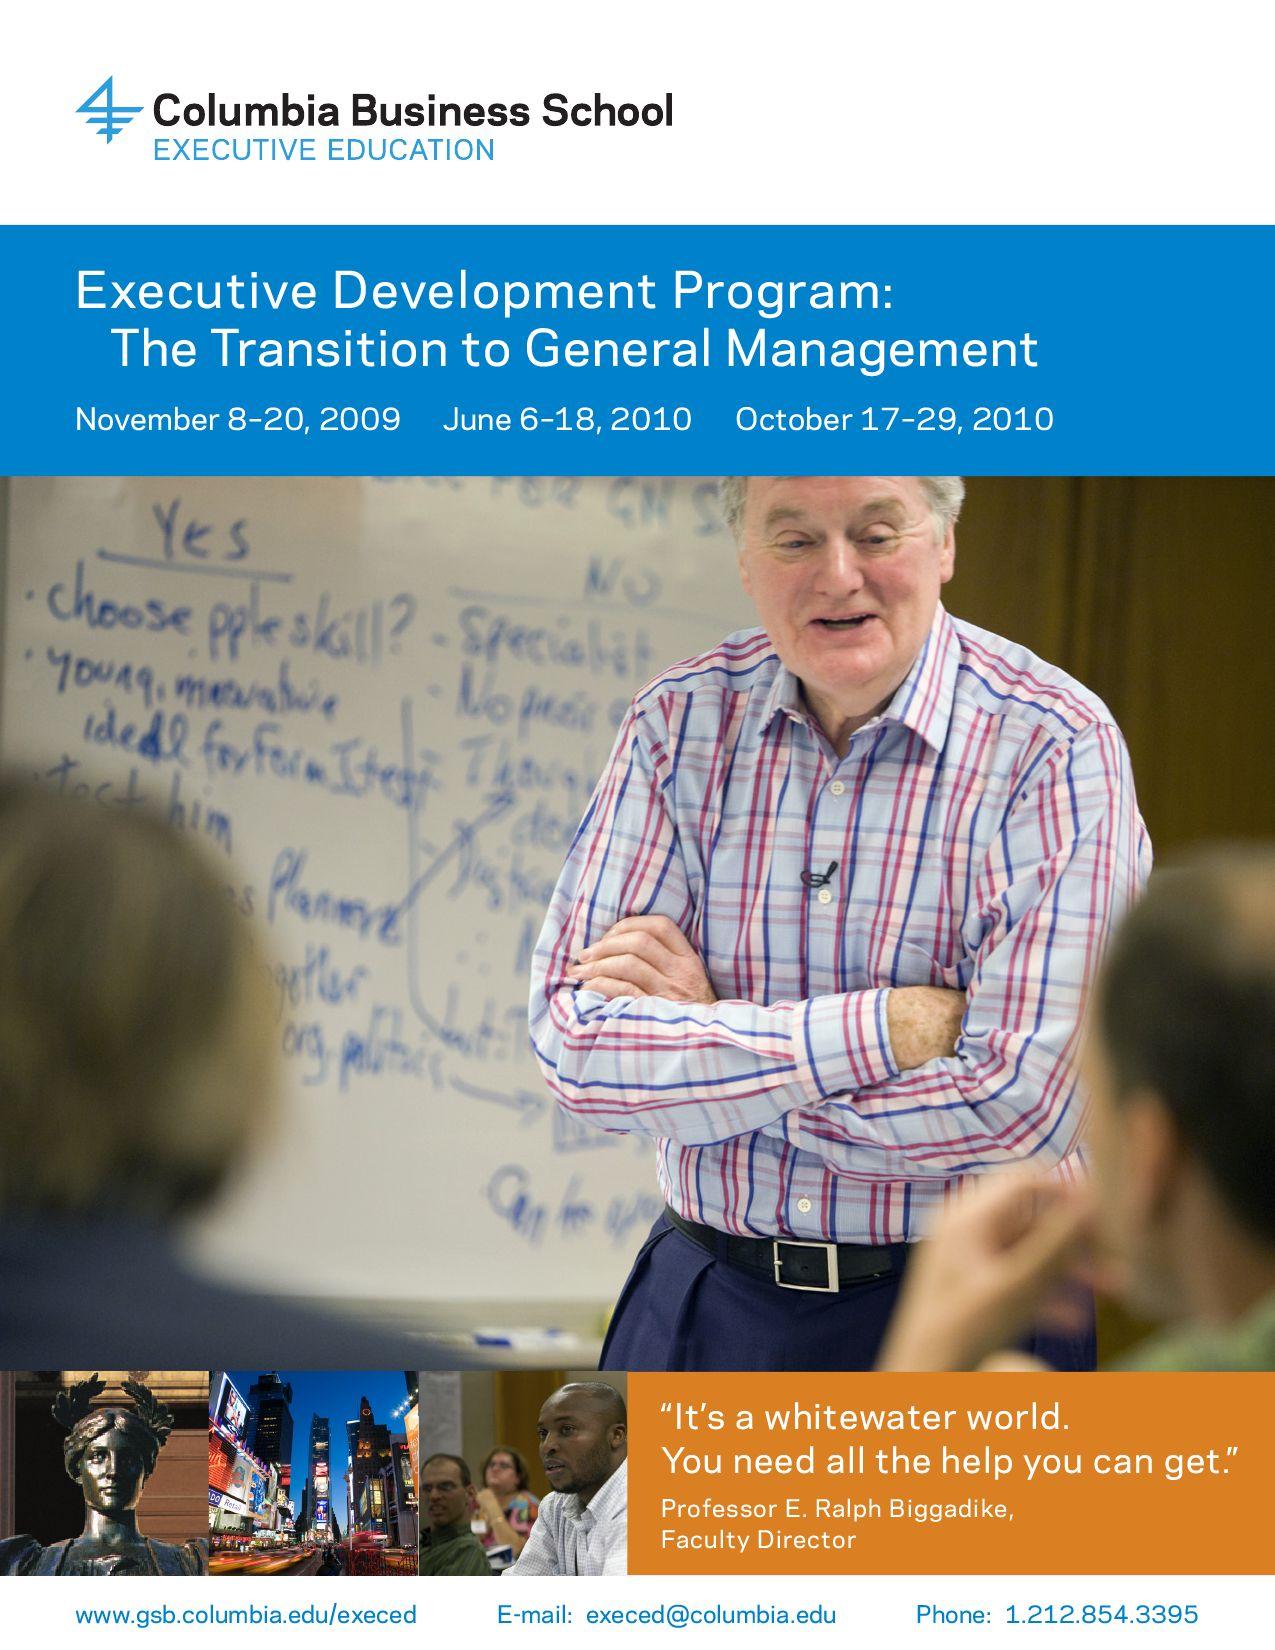 Executive Development Program: Transition to General